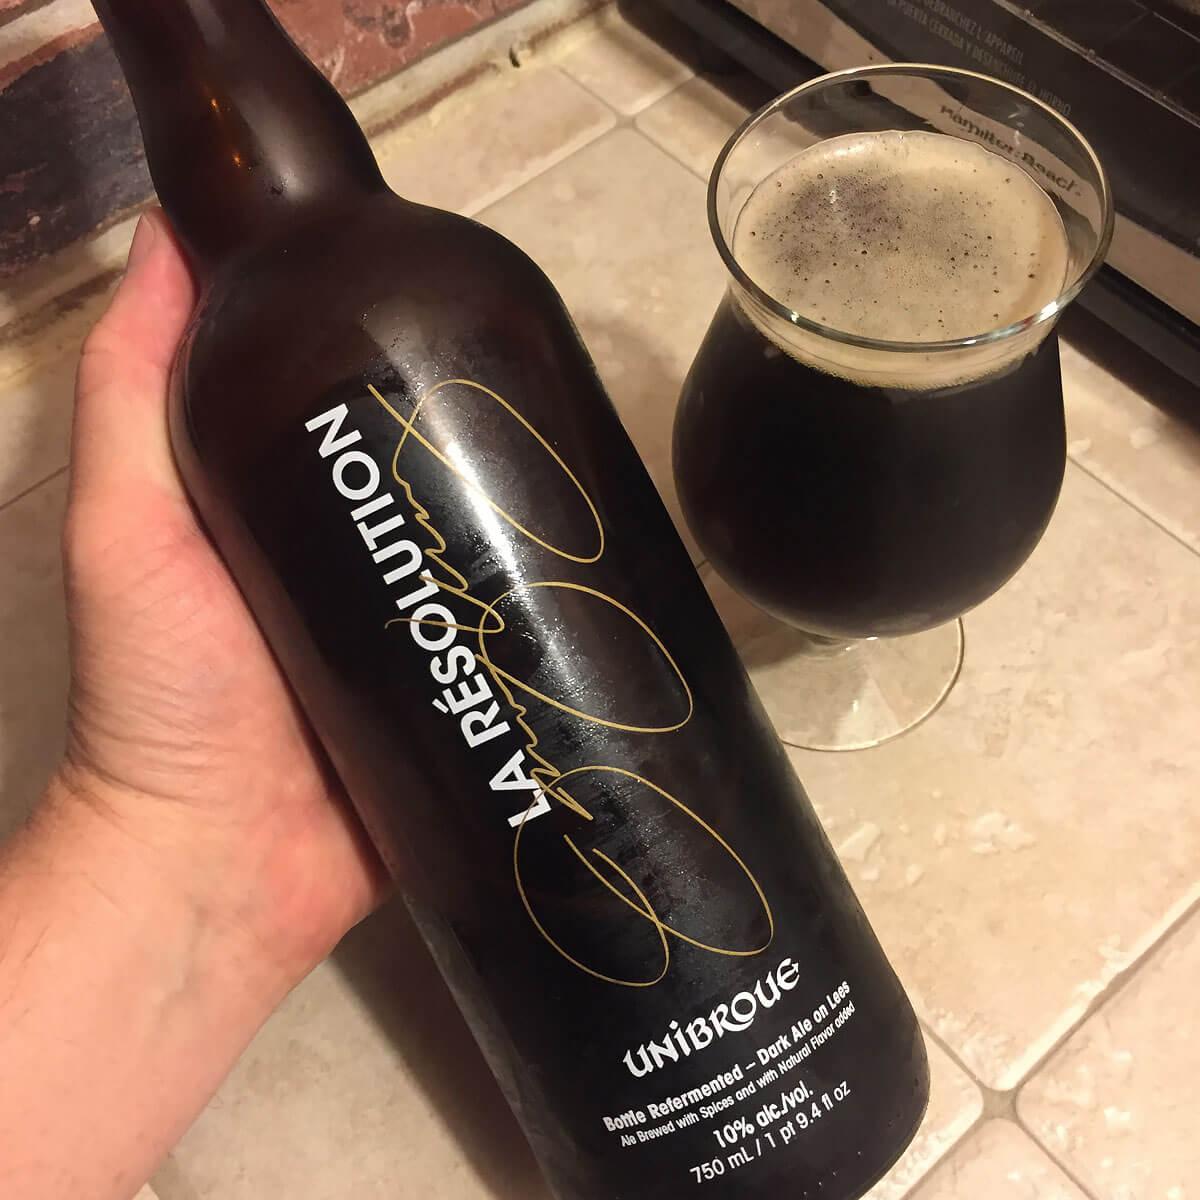 La Résolution, a Belgian-style Strong Dark Ale brewed by Unibroue